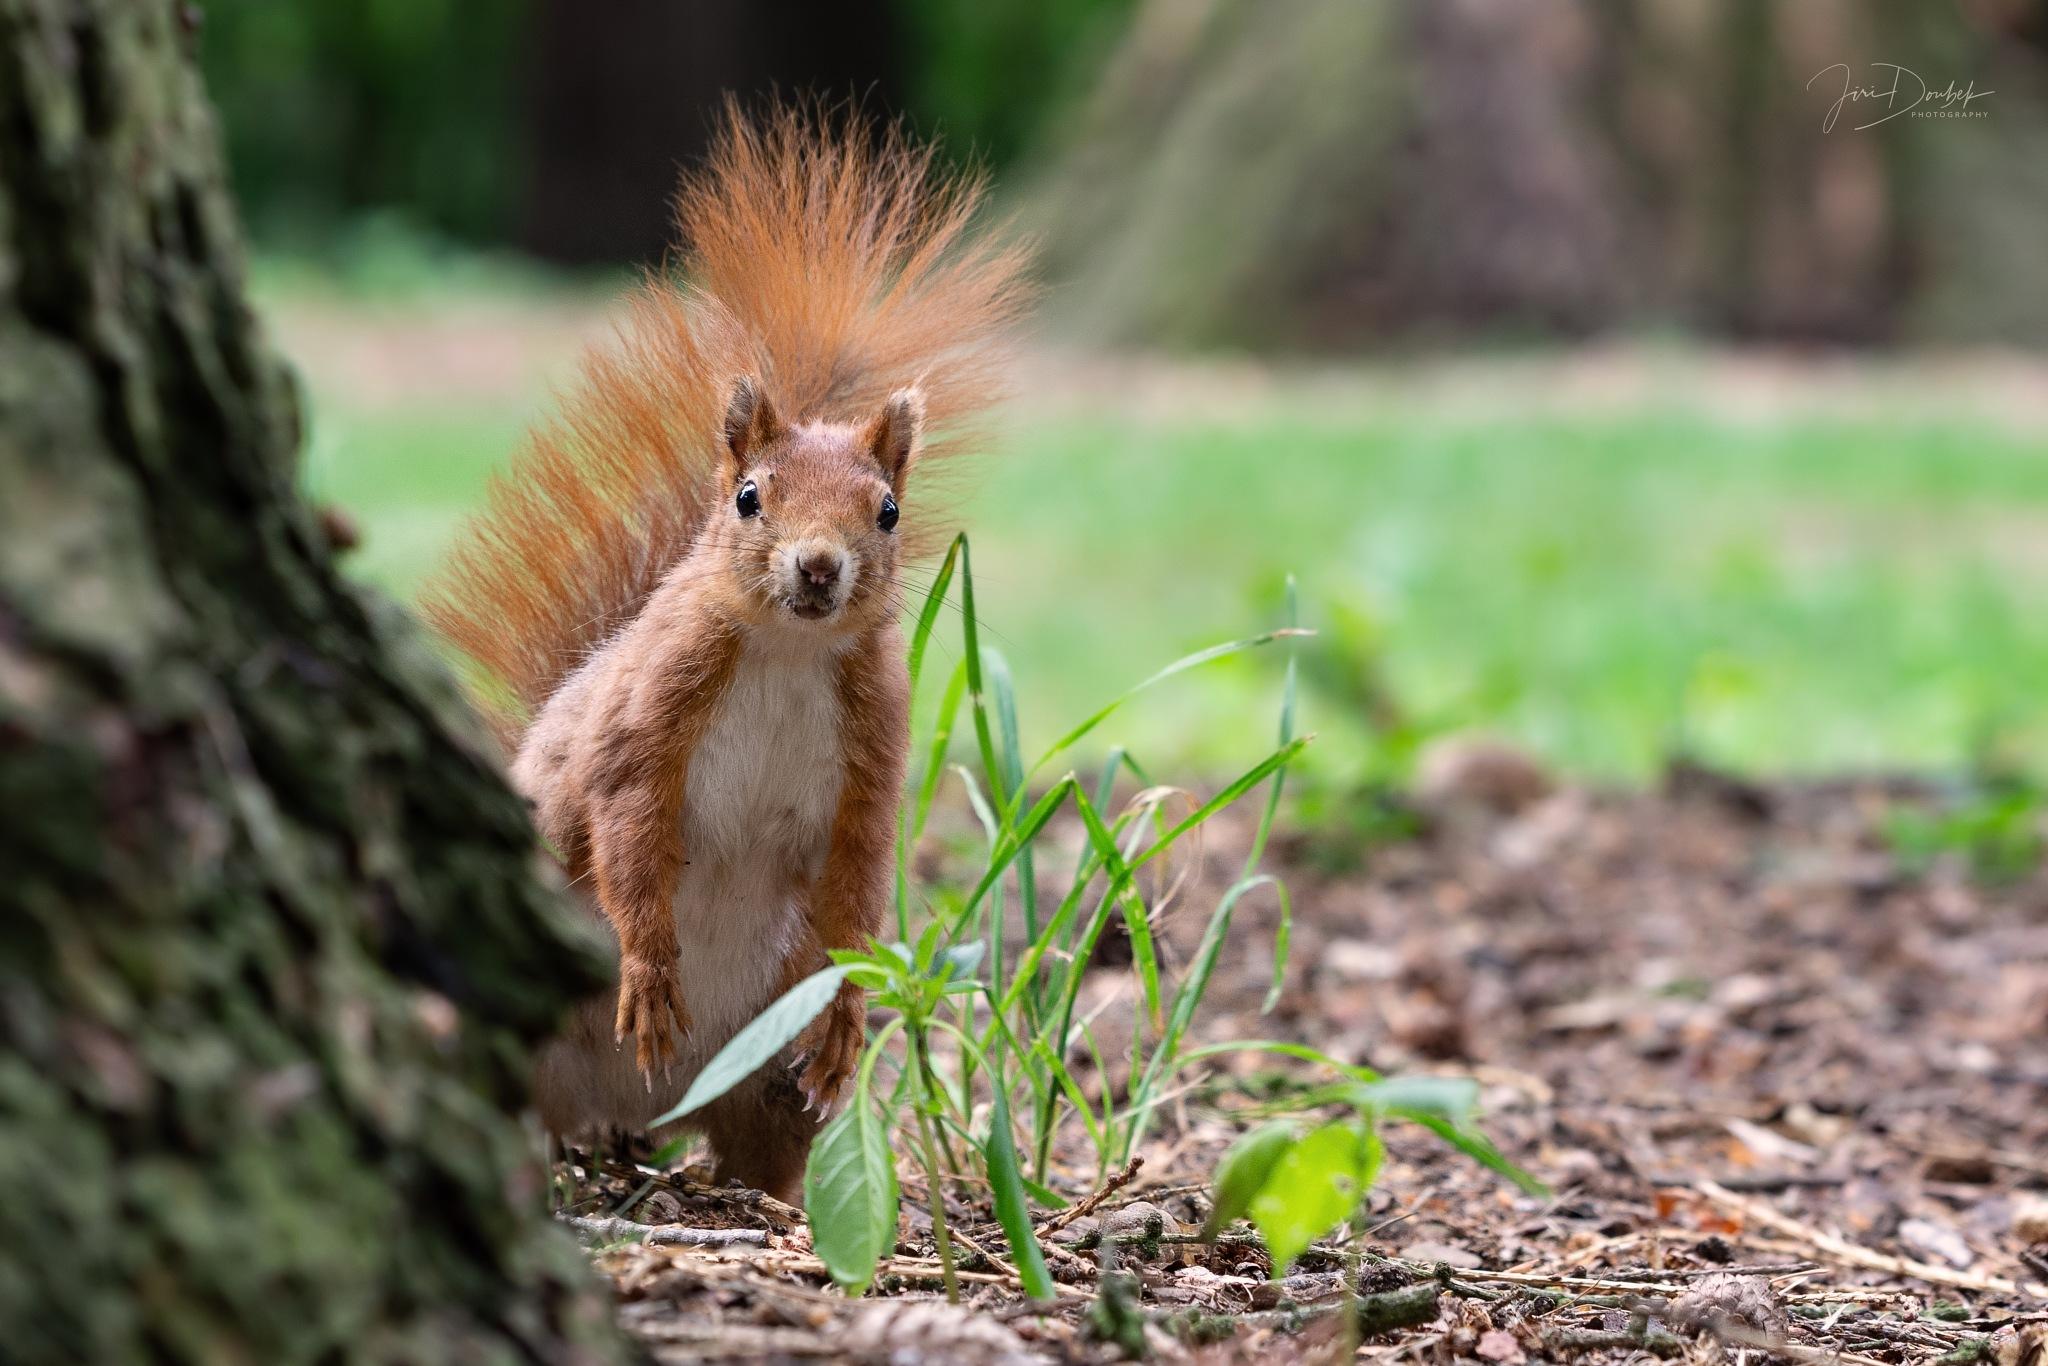 Red Squirrel by Jiri Doubek